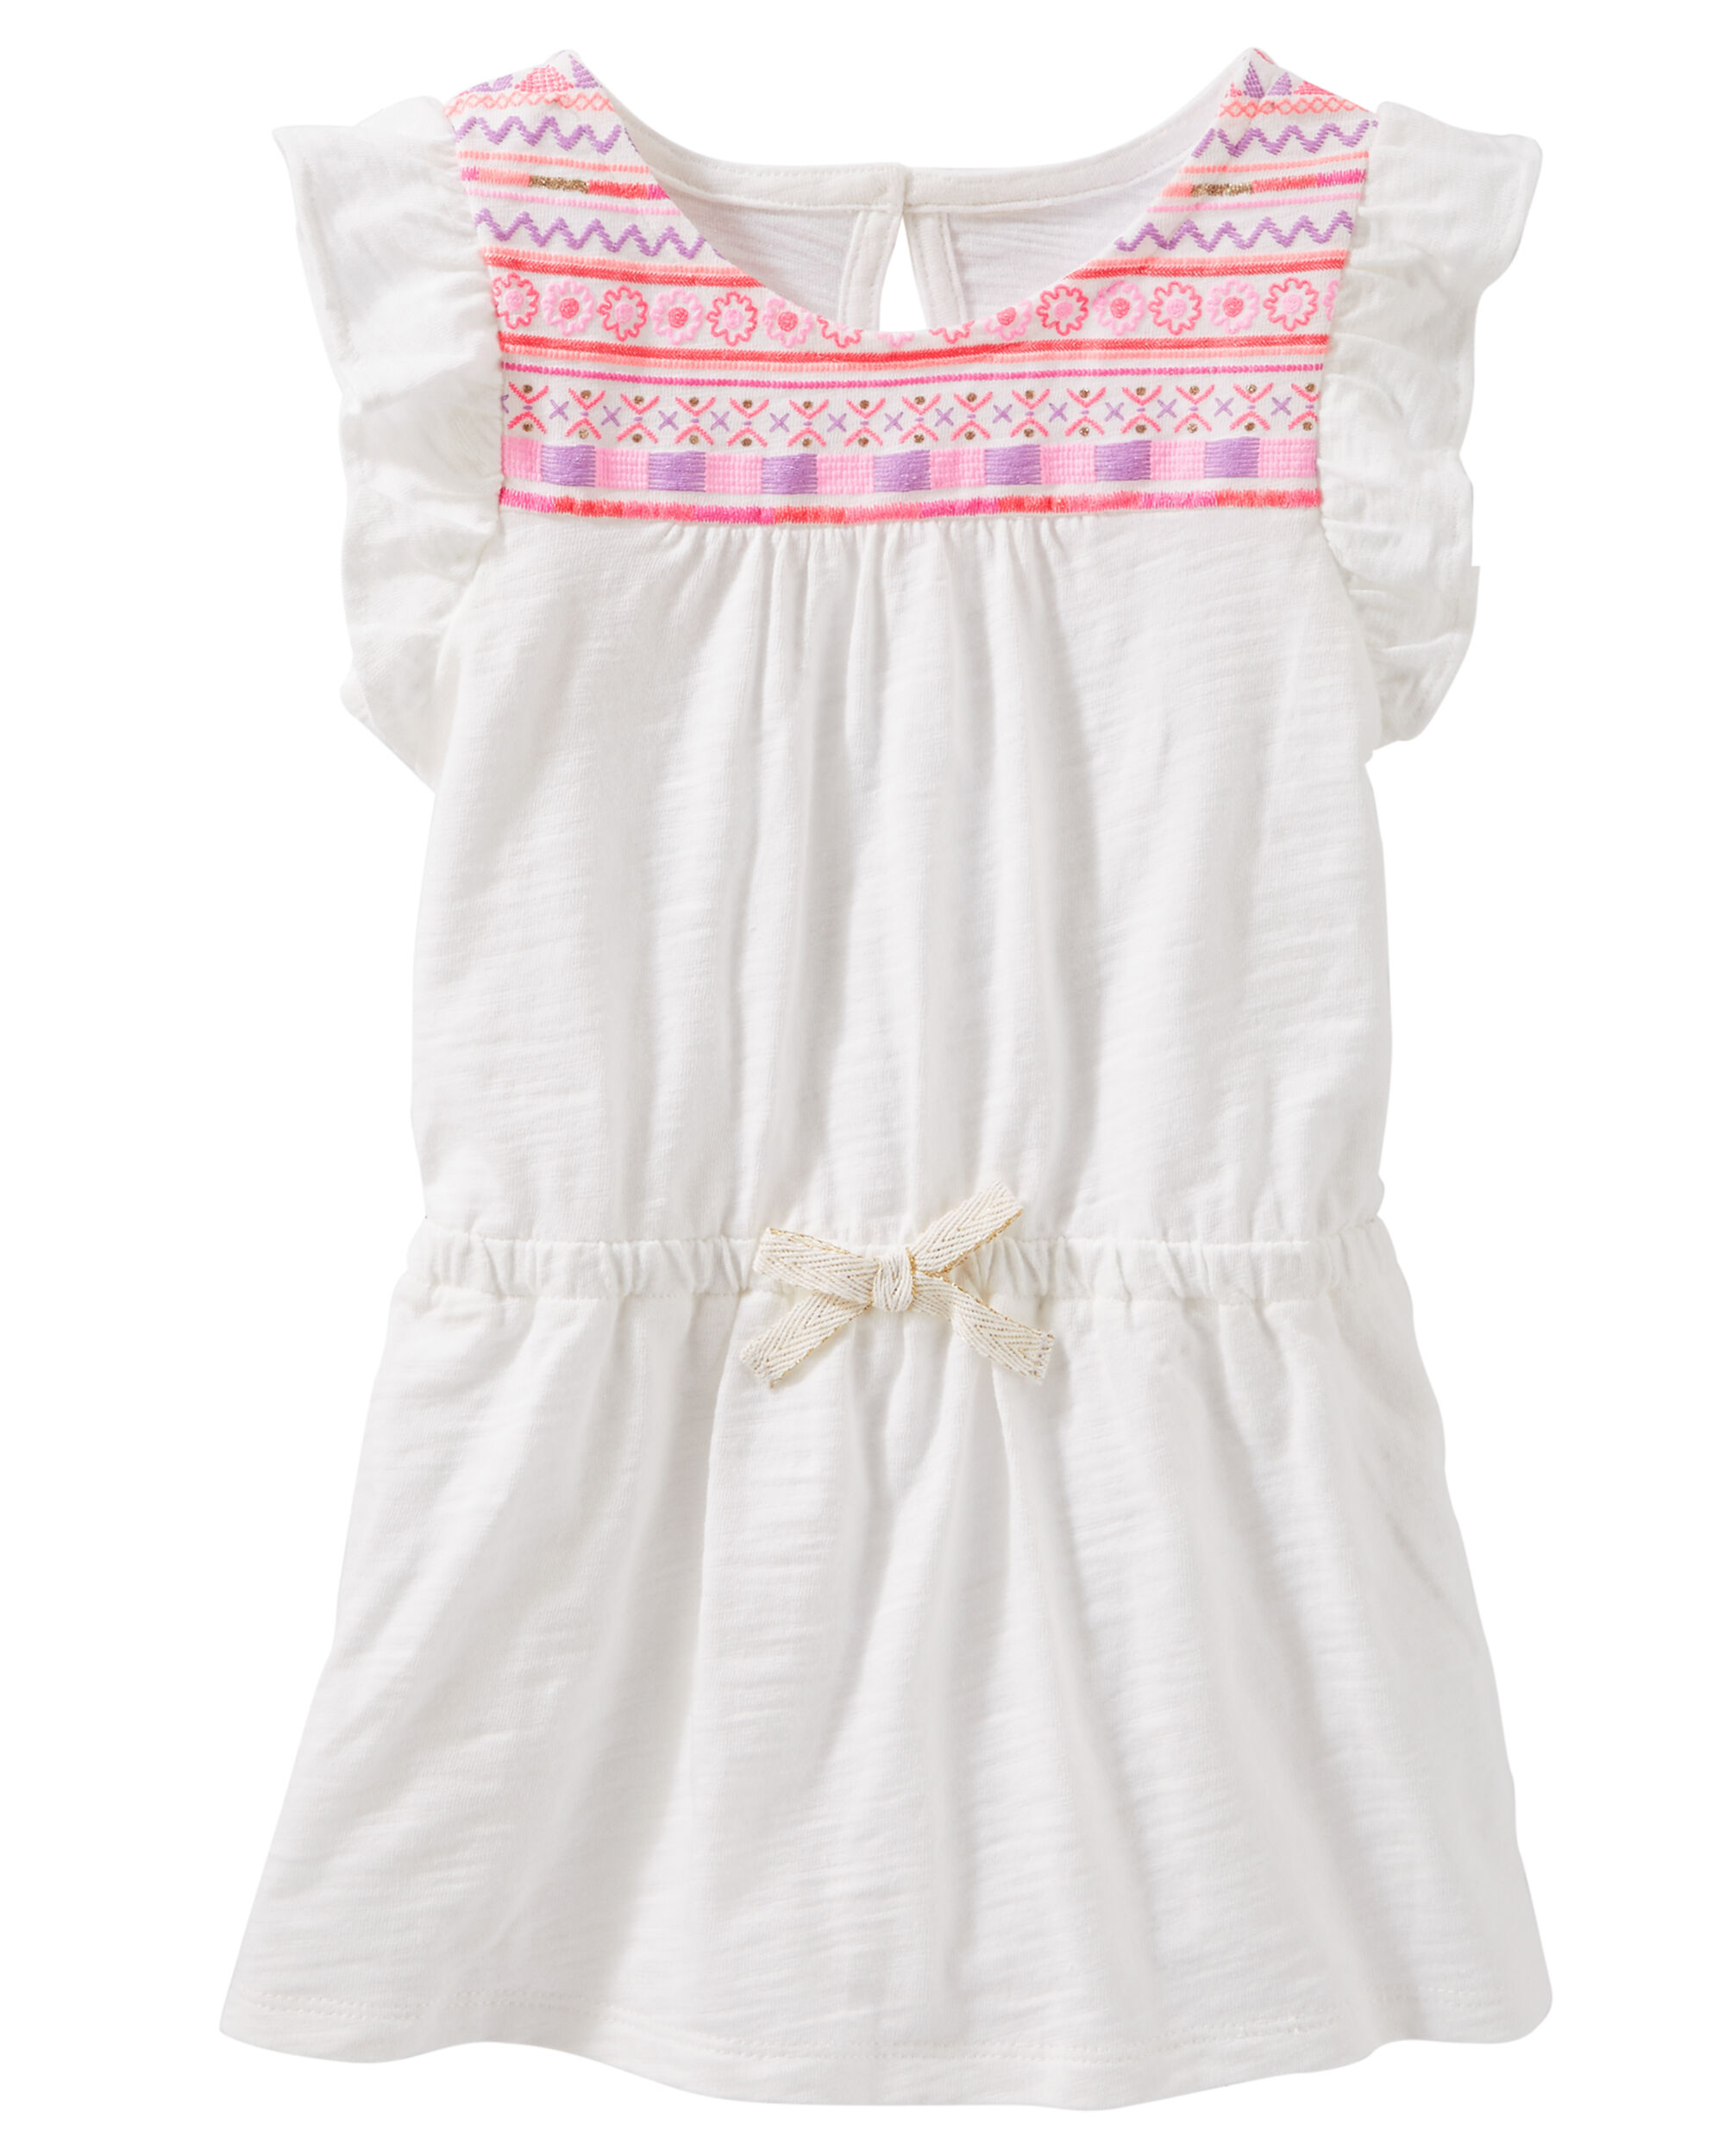 OshKosh BGosh Baby Girls Embellished Neck Tank Top